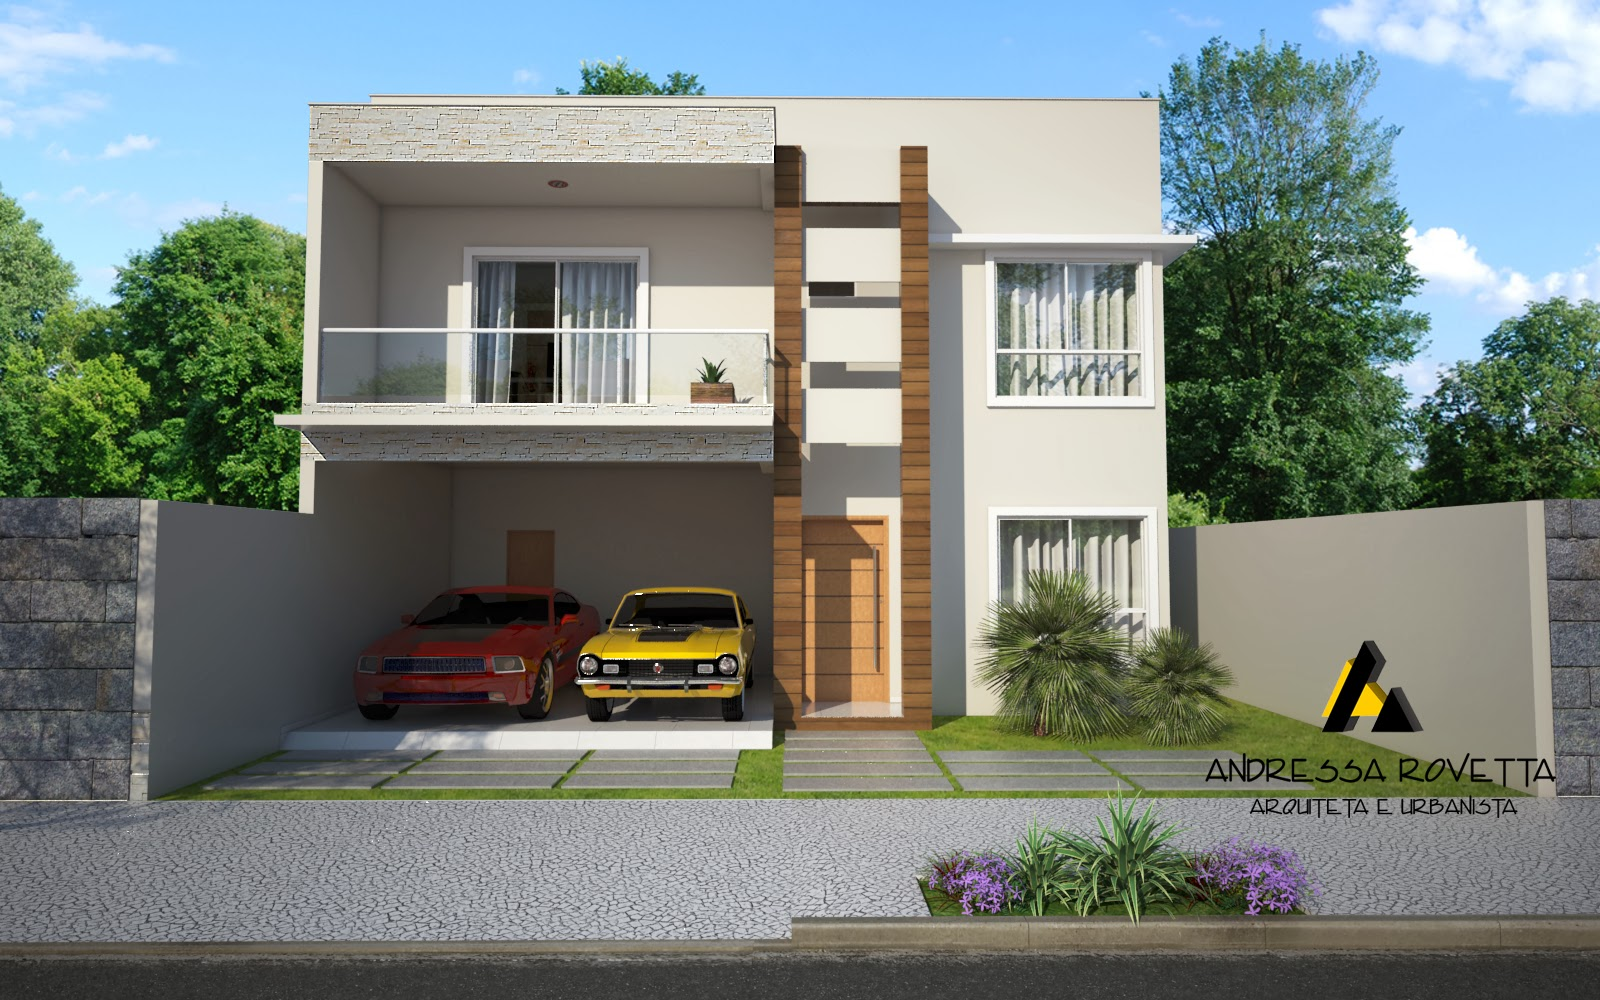 Fotos de fachadas de casas duplex decorando casas for Fachadas para apartamentos pequenos